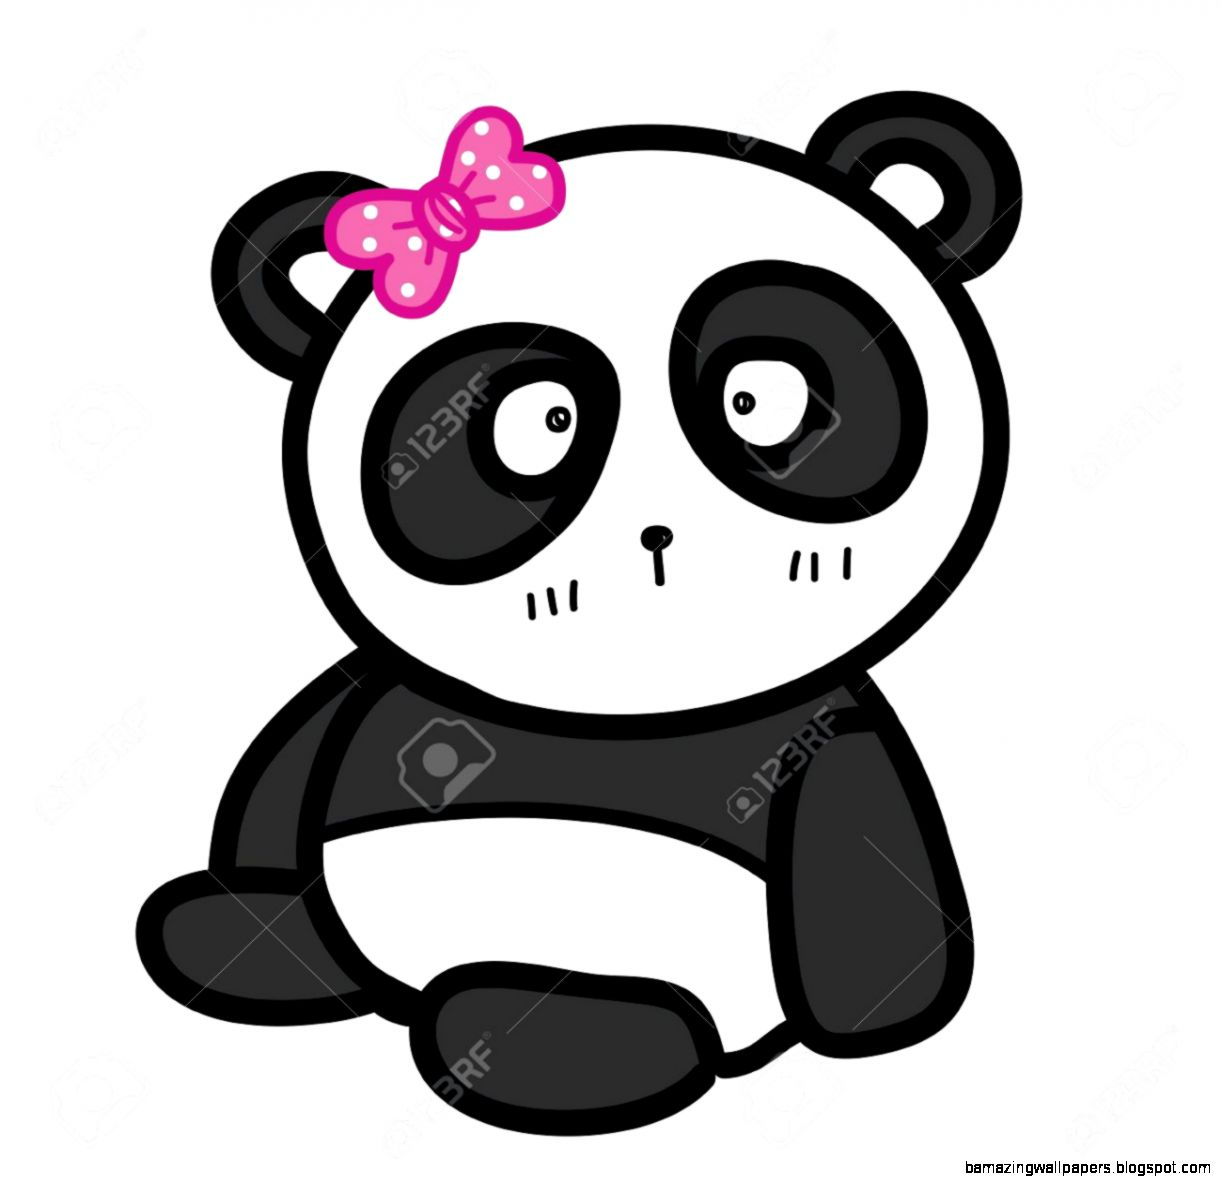 Cute panda baby drawing - photo#12